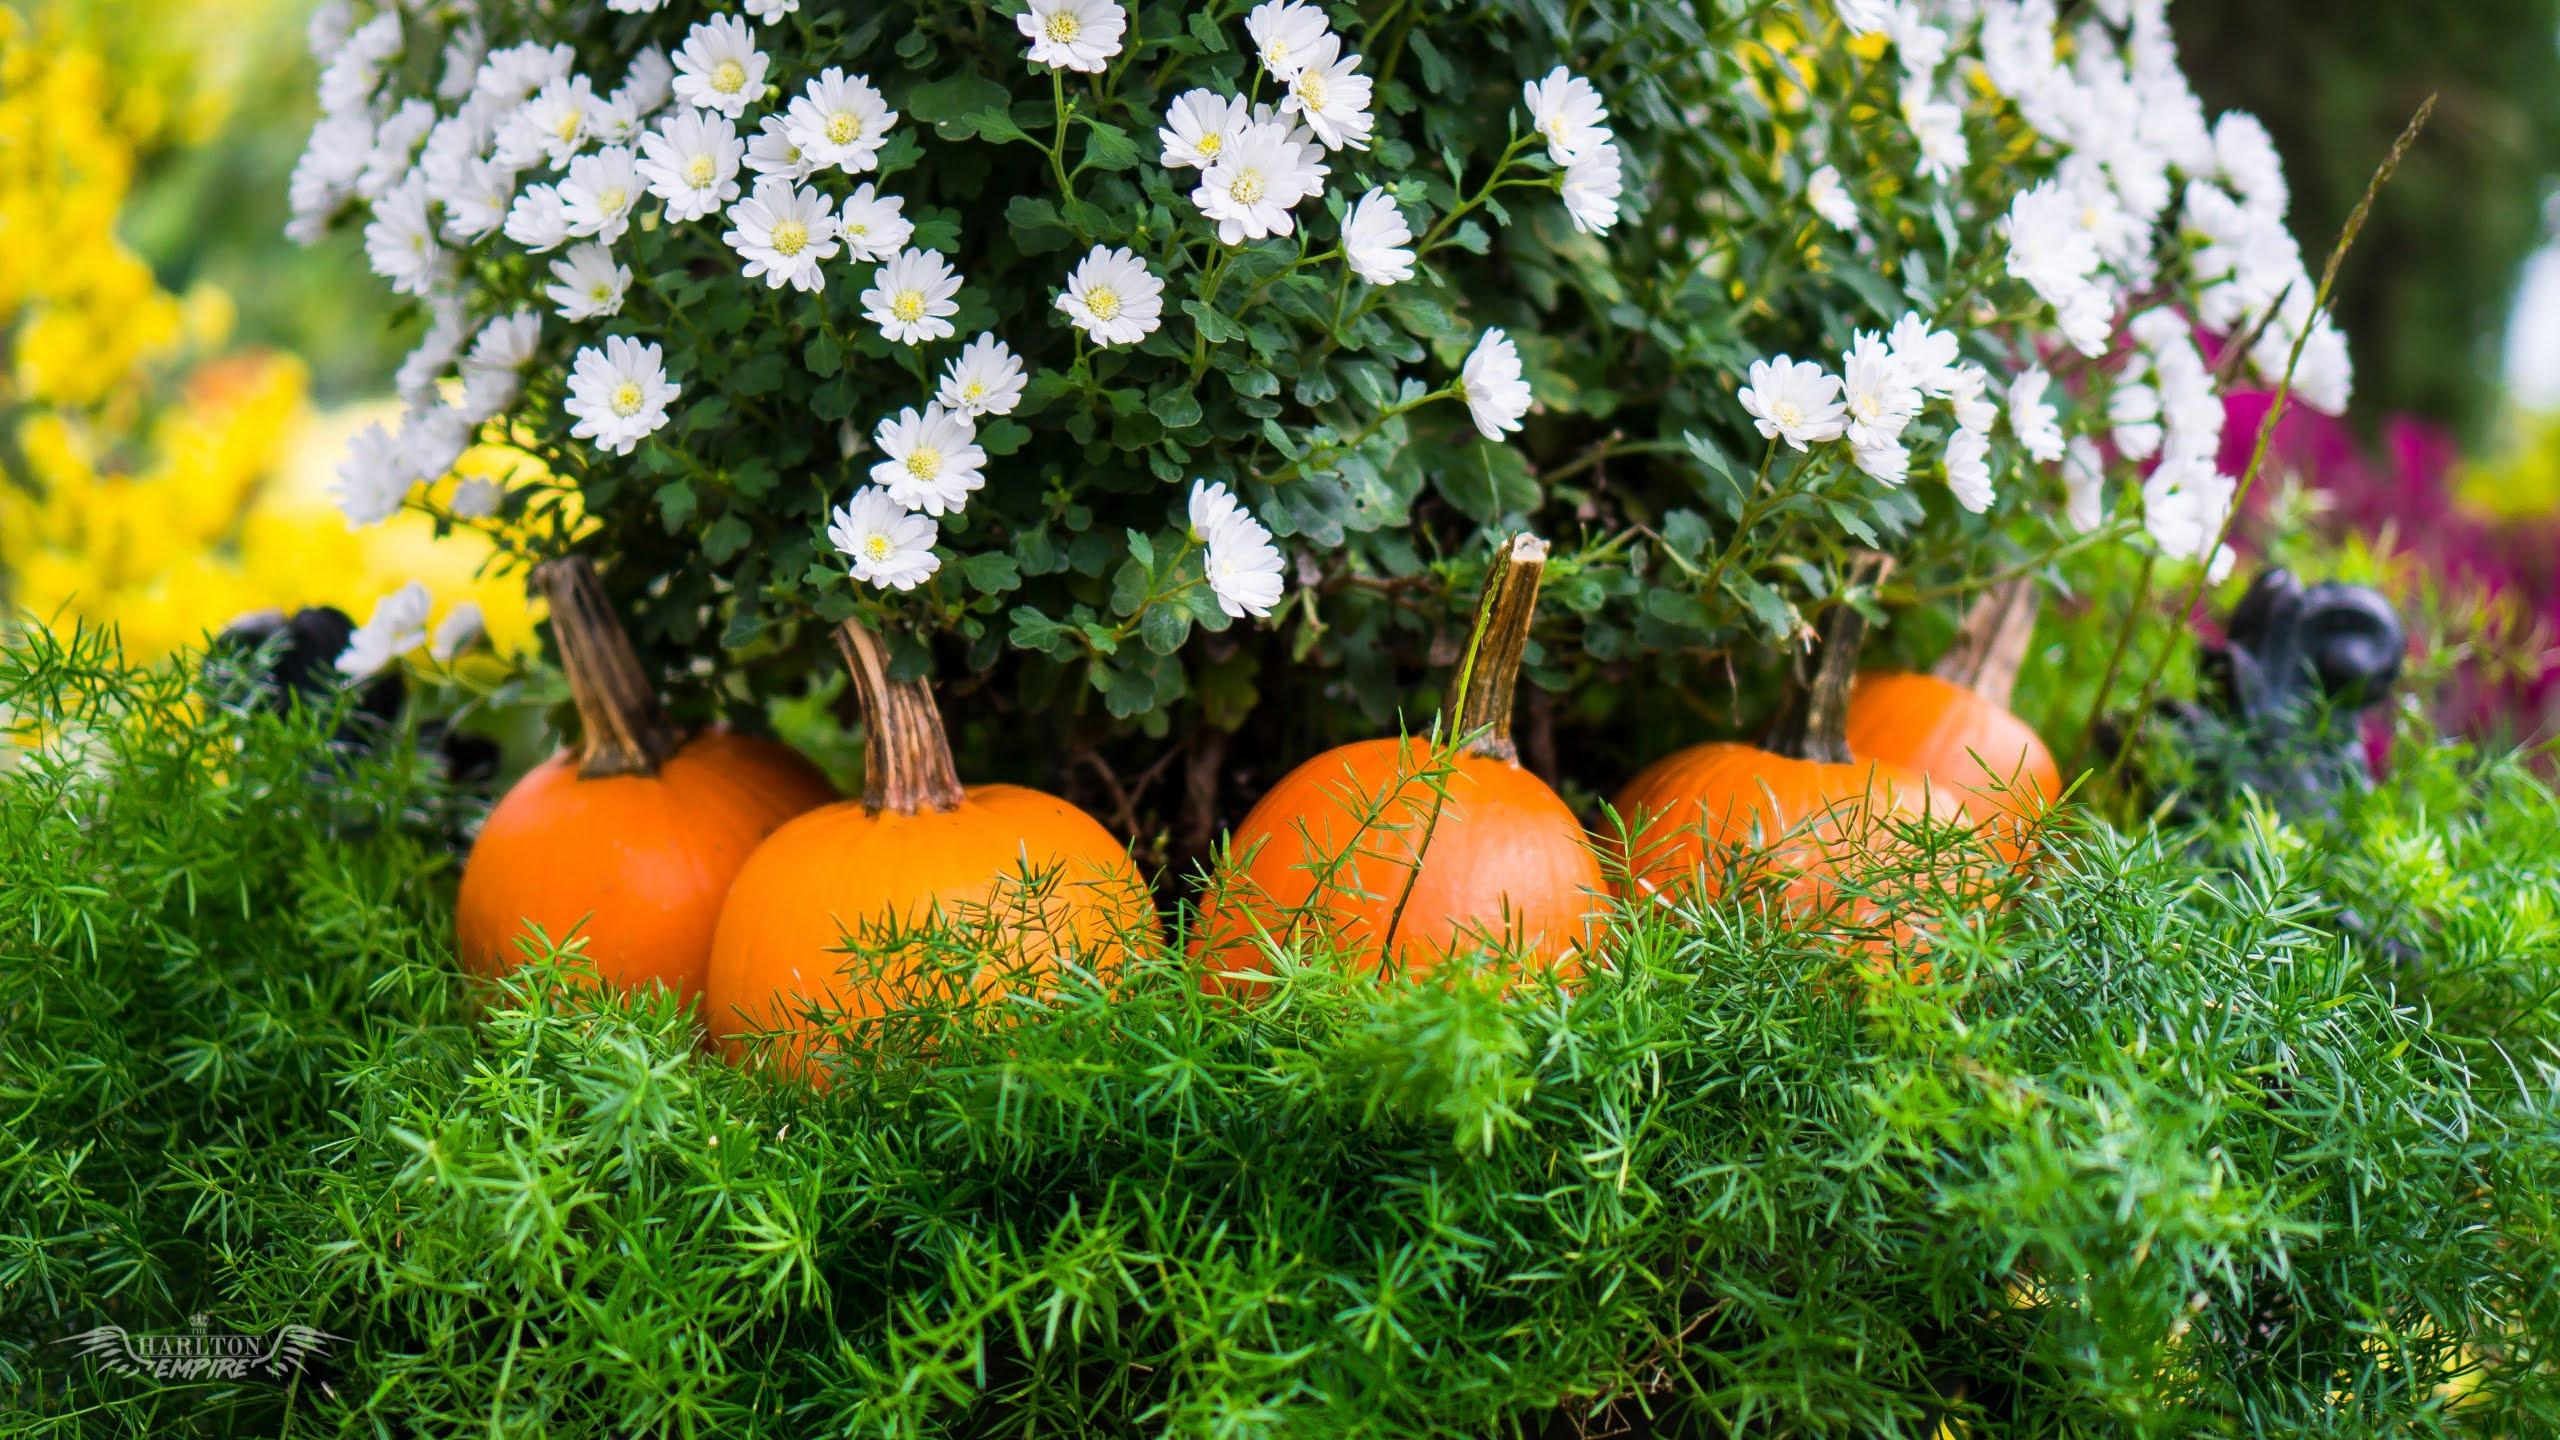 Free Fall Autumn Desktop Wallpapers 16